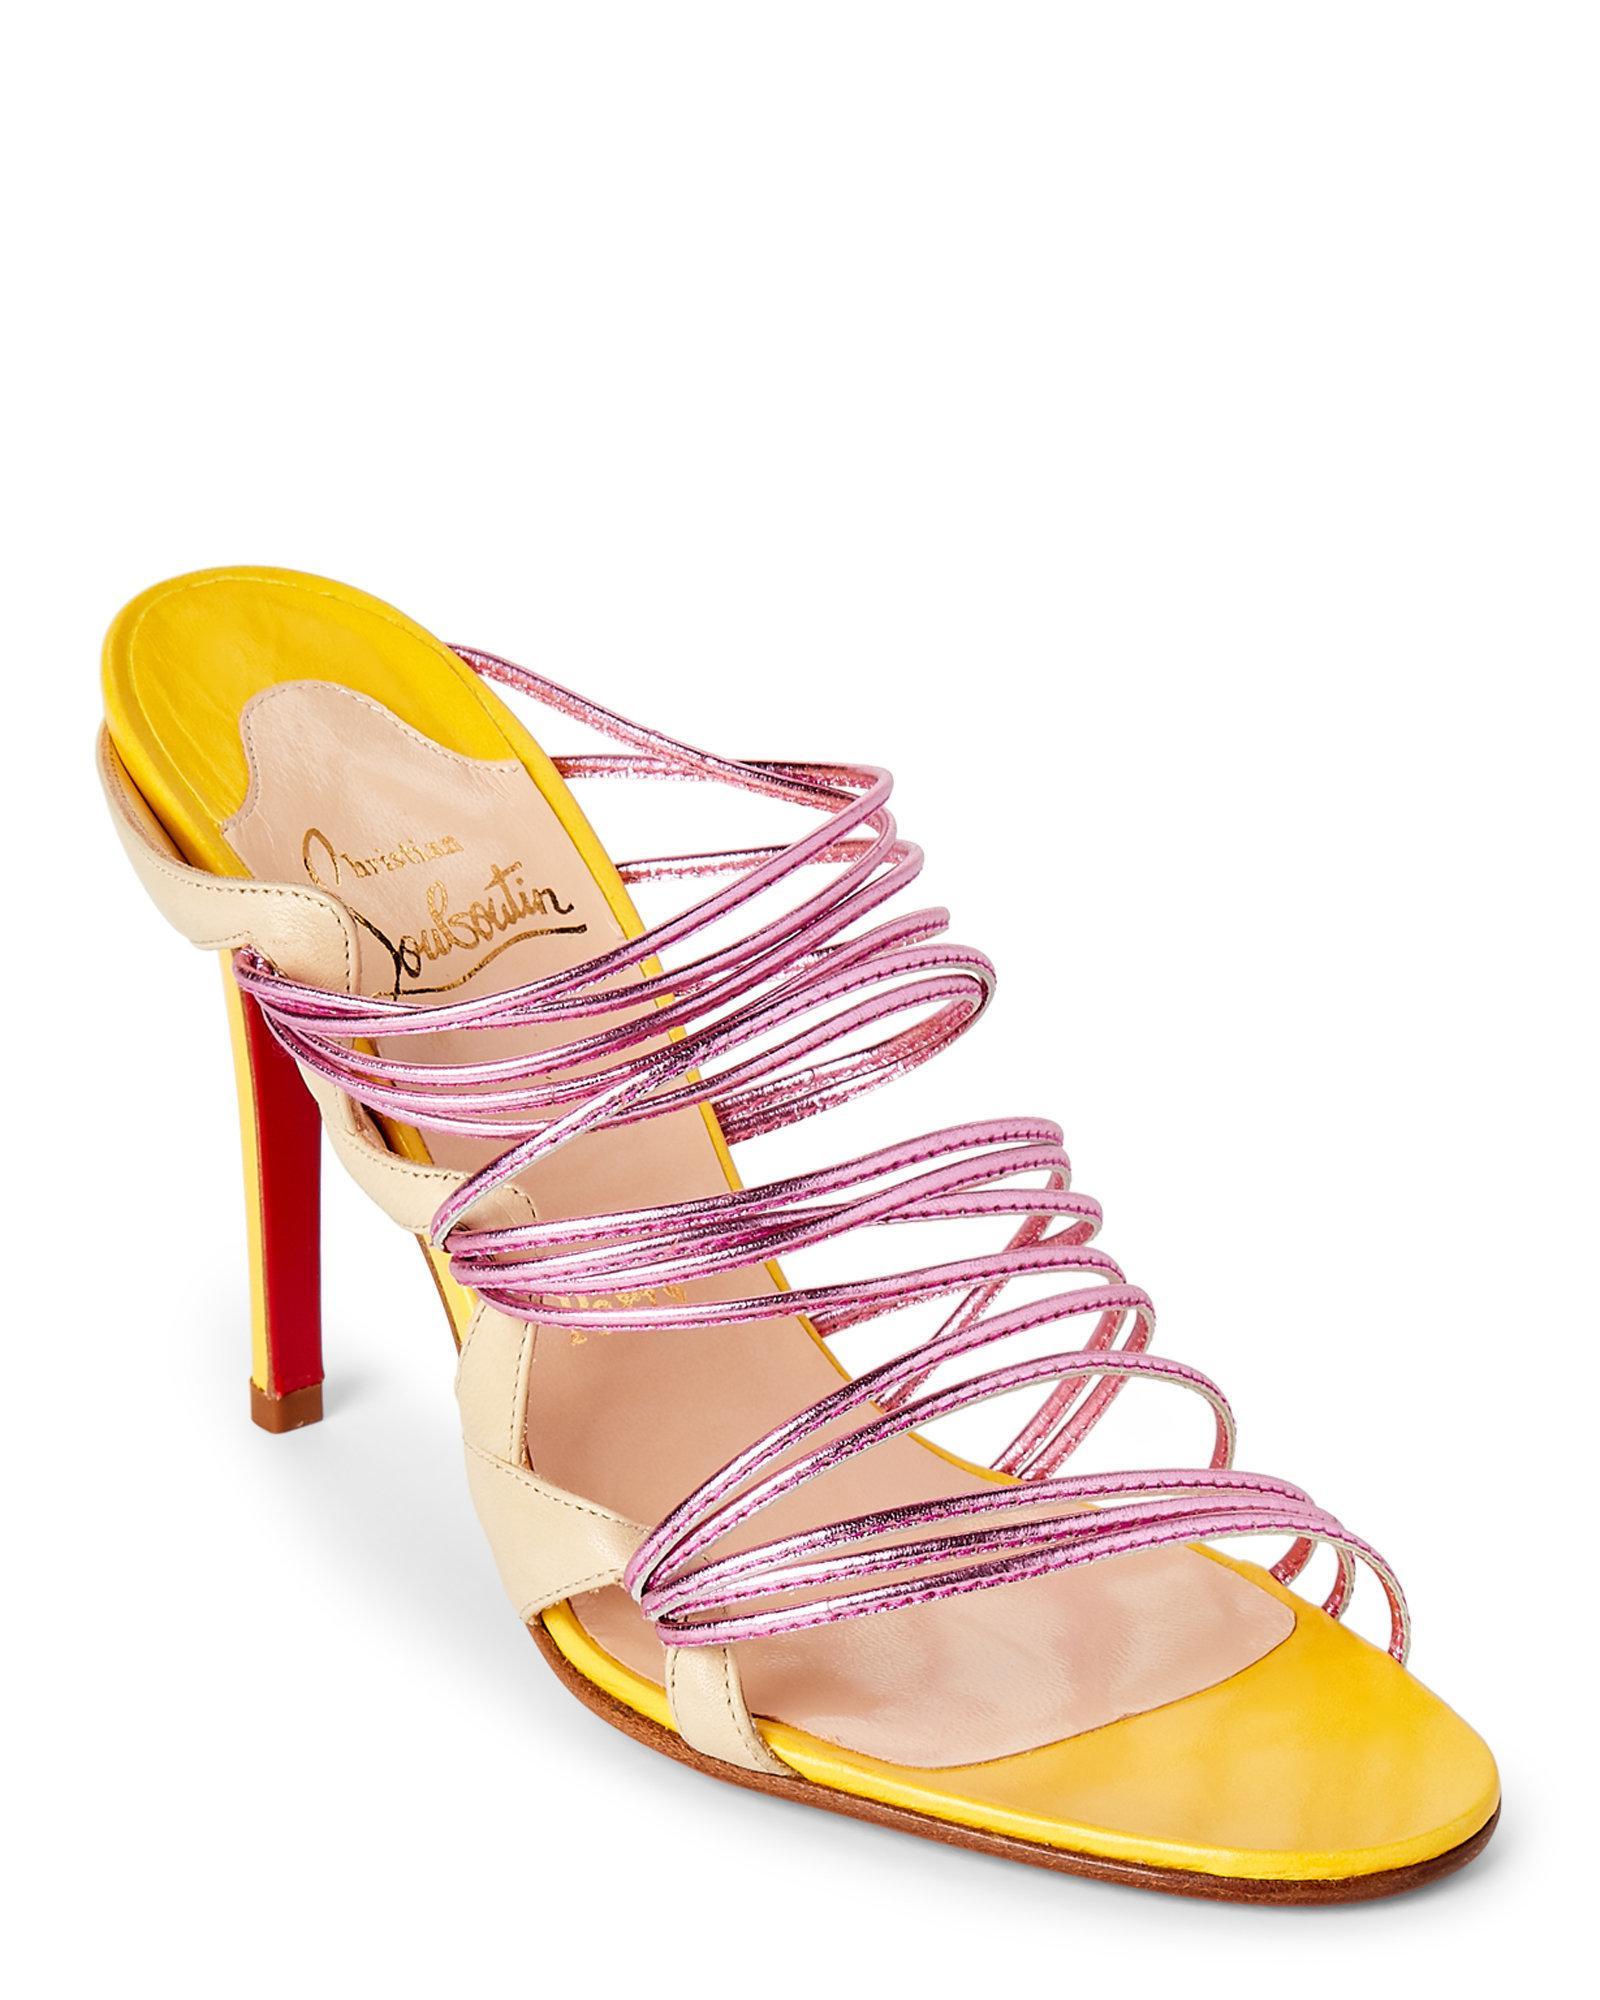 Lyst - Christian Louboutin Frescobaldi Strappy High Heel Sandals in Pink c2c419c2c